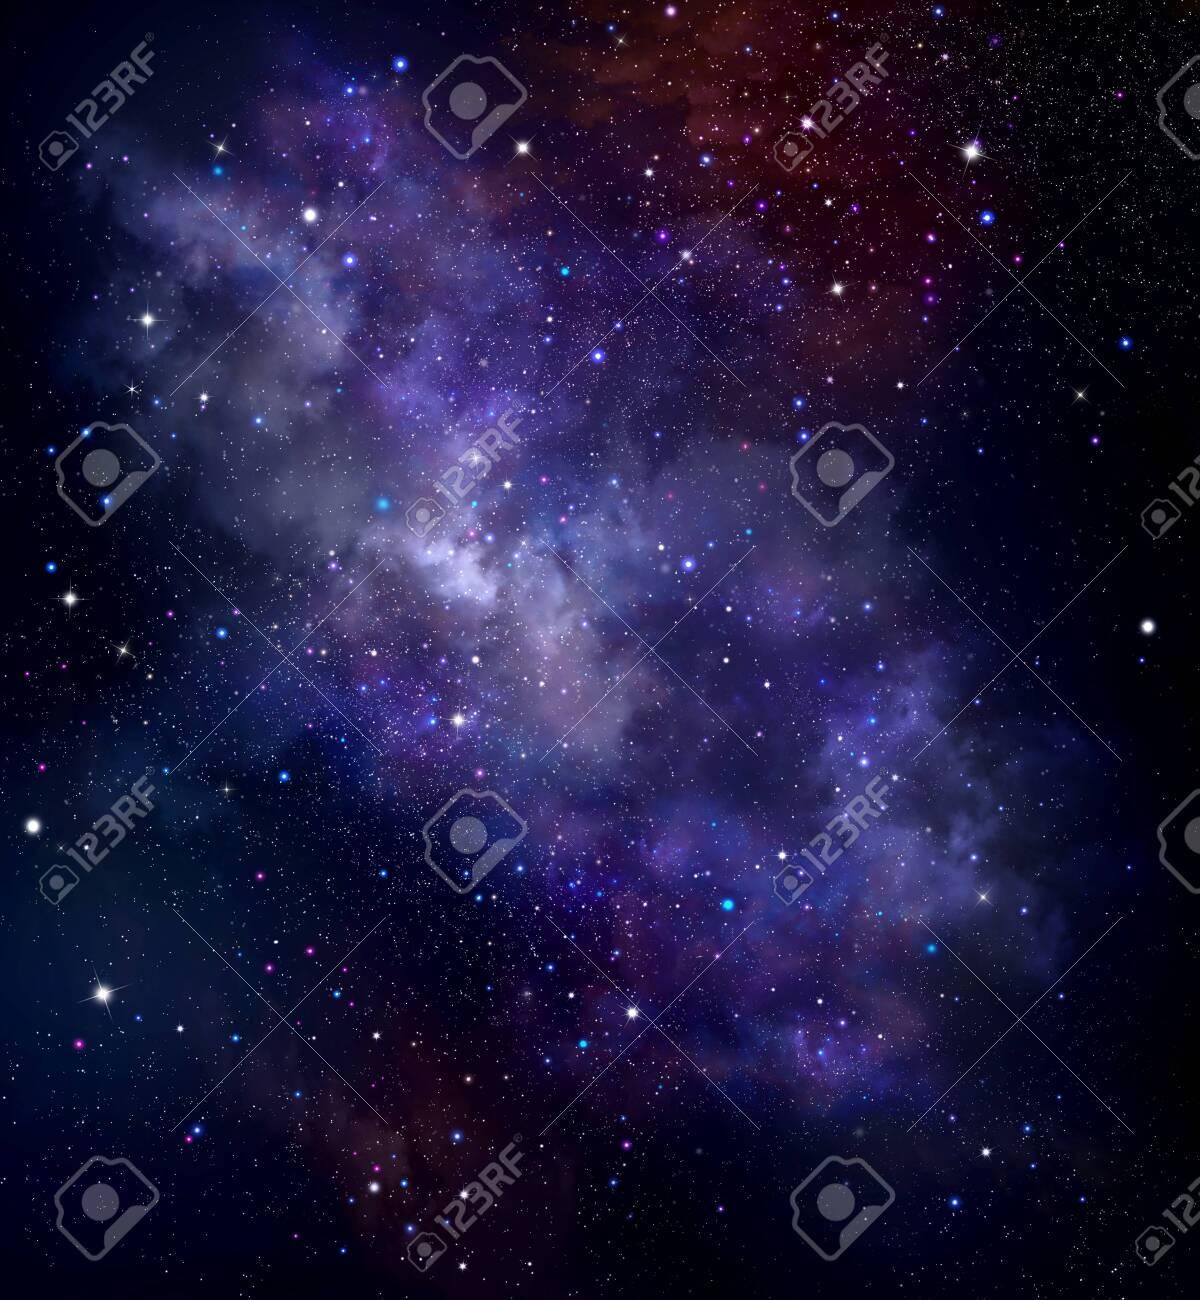 Night sky, space background with nebula and stars - 124005638